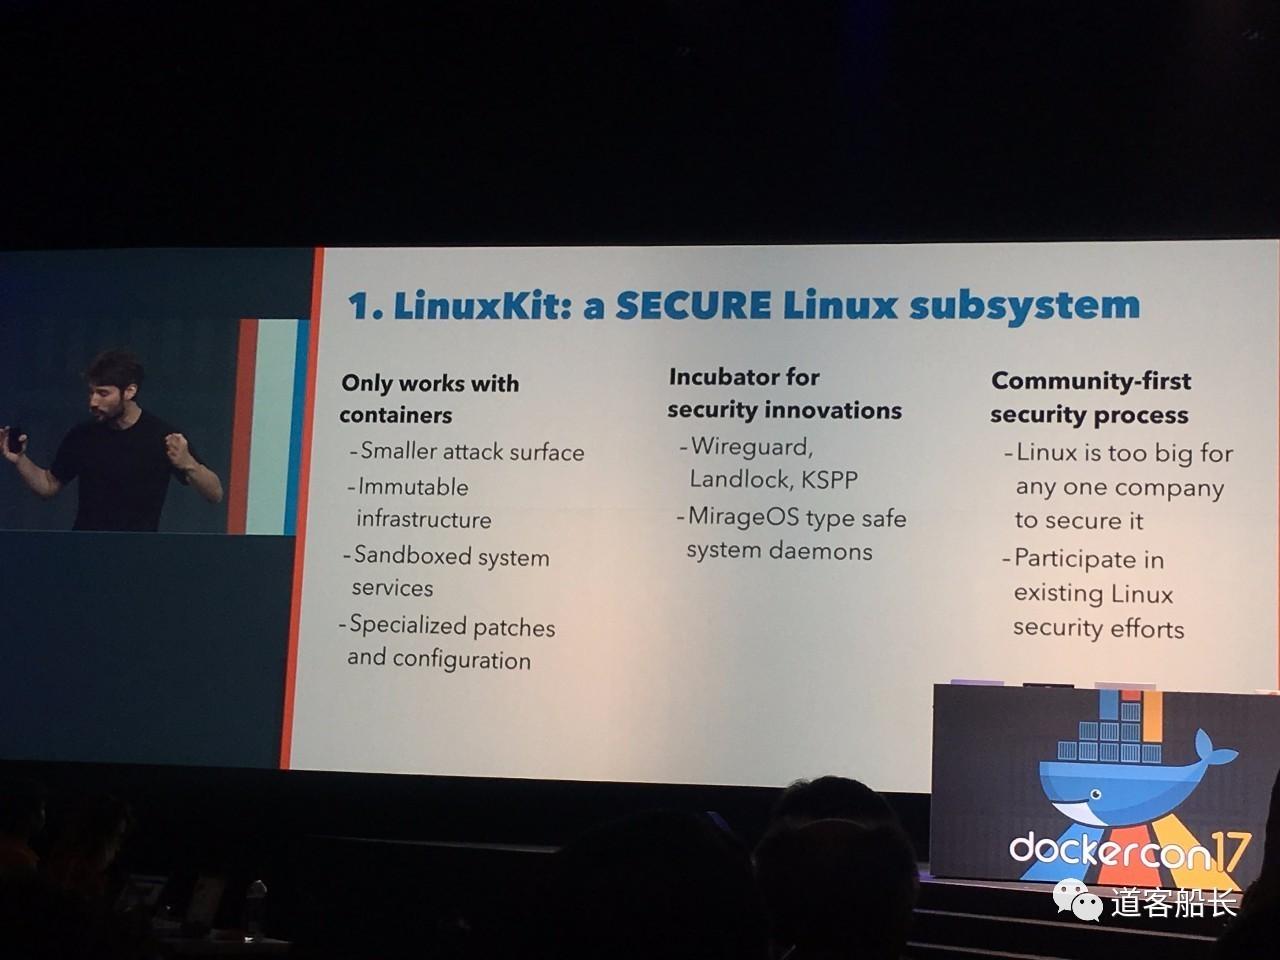 DockerCon 2017 D1: 发布 LinuxKit 染指 OS,Docker 项目演化为 Moby插图(7)